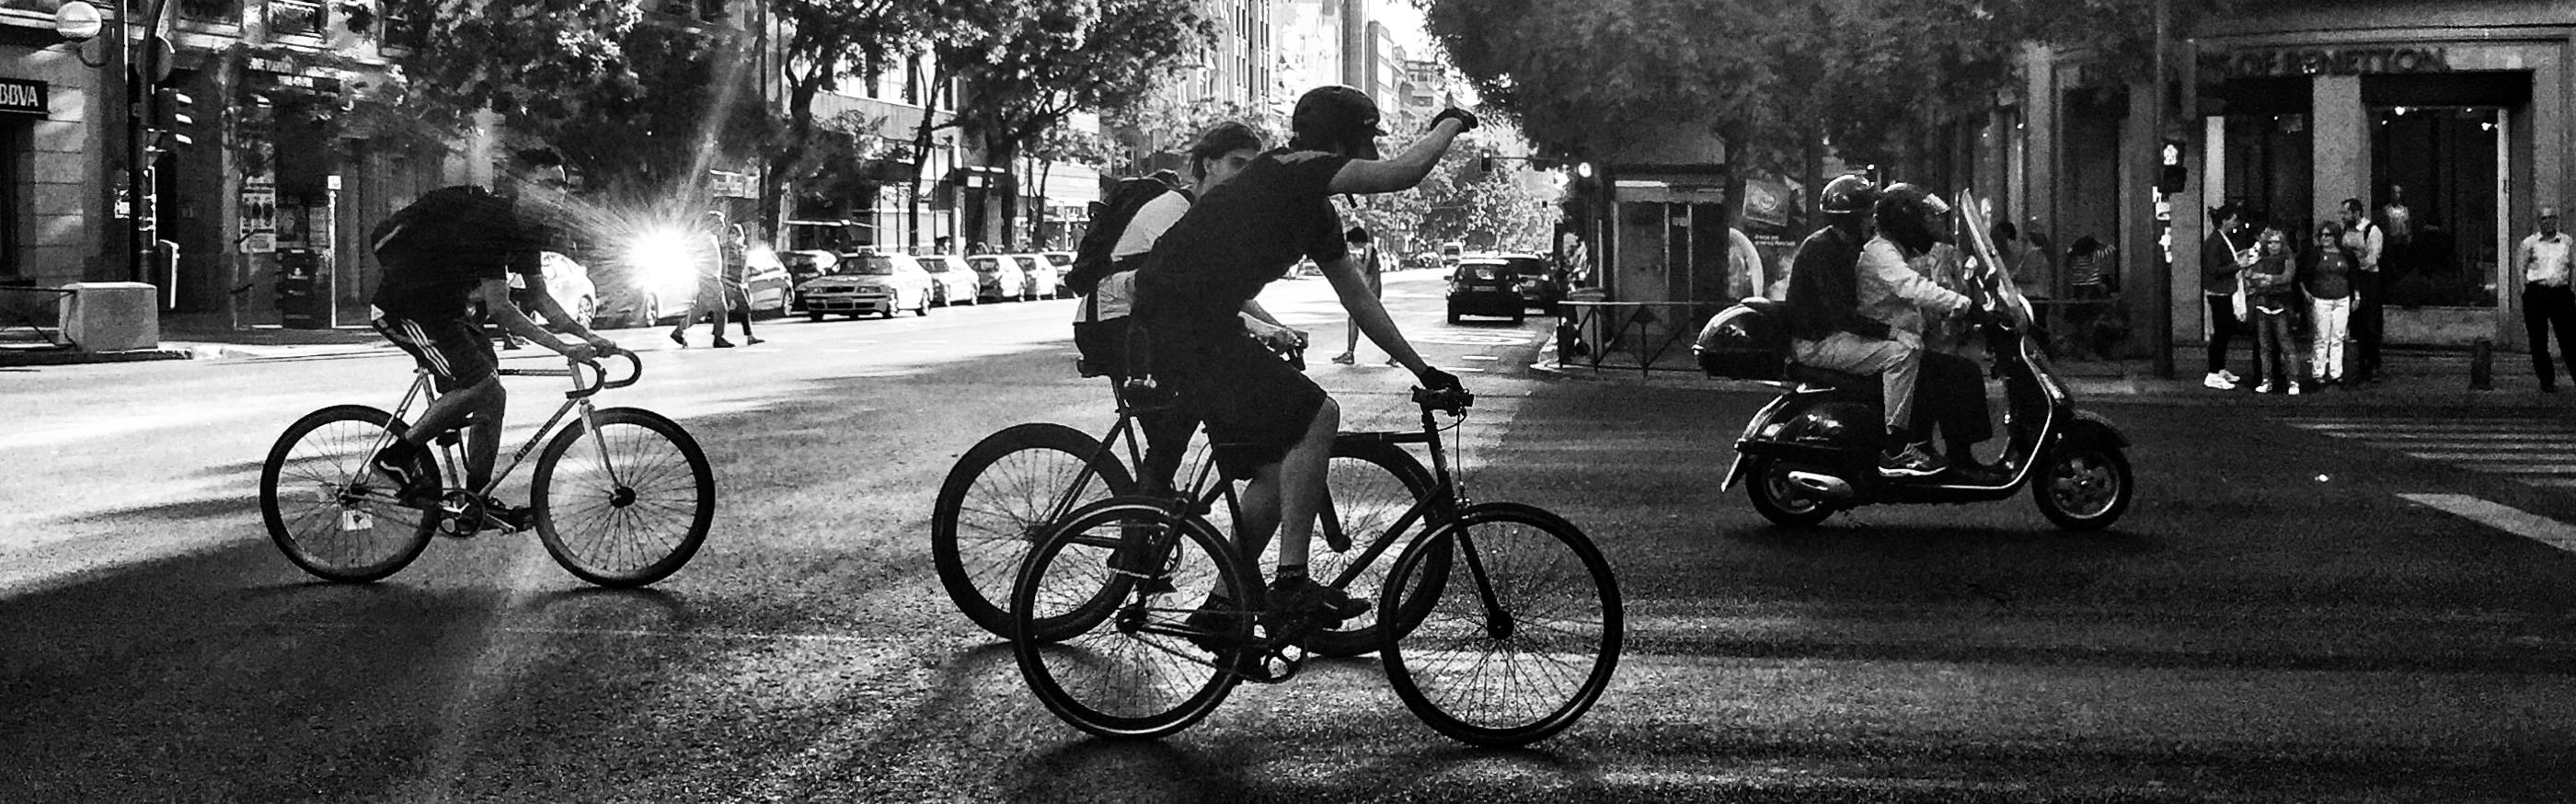 bici-00